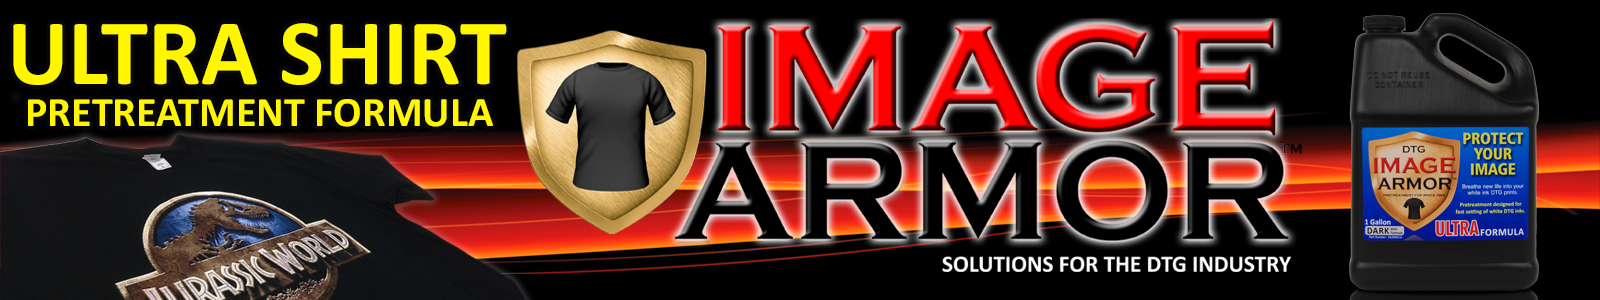 Image Armor ULTRA Pretreatment Header